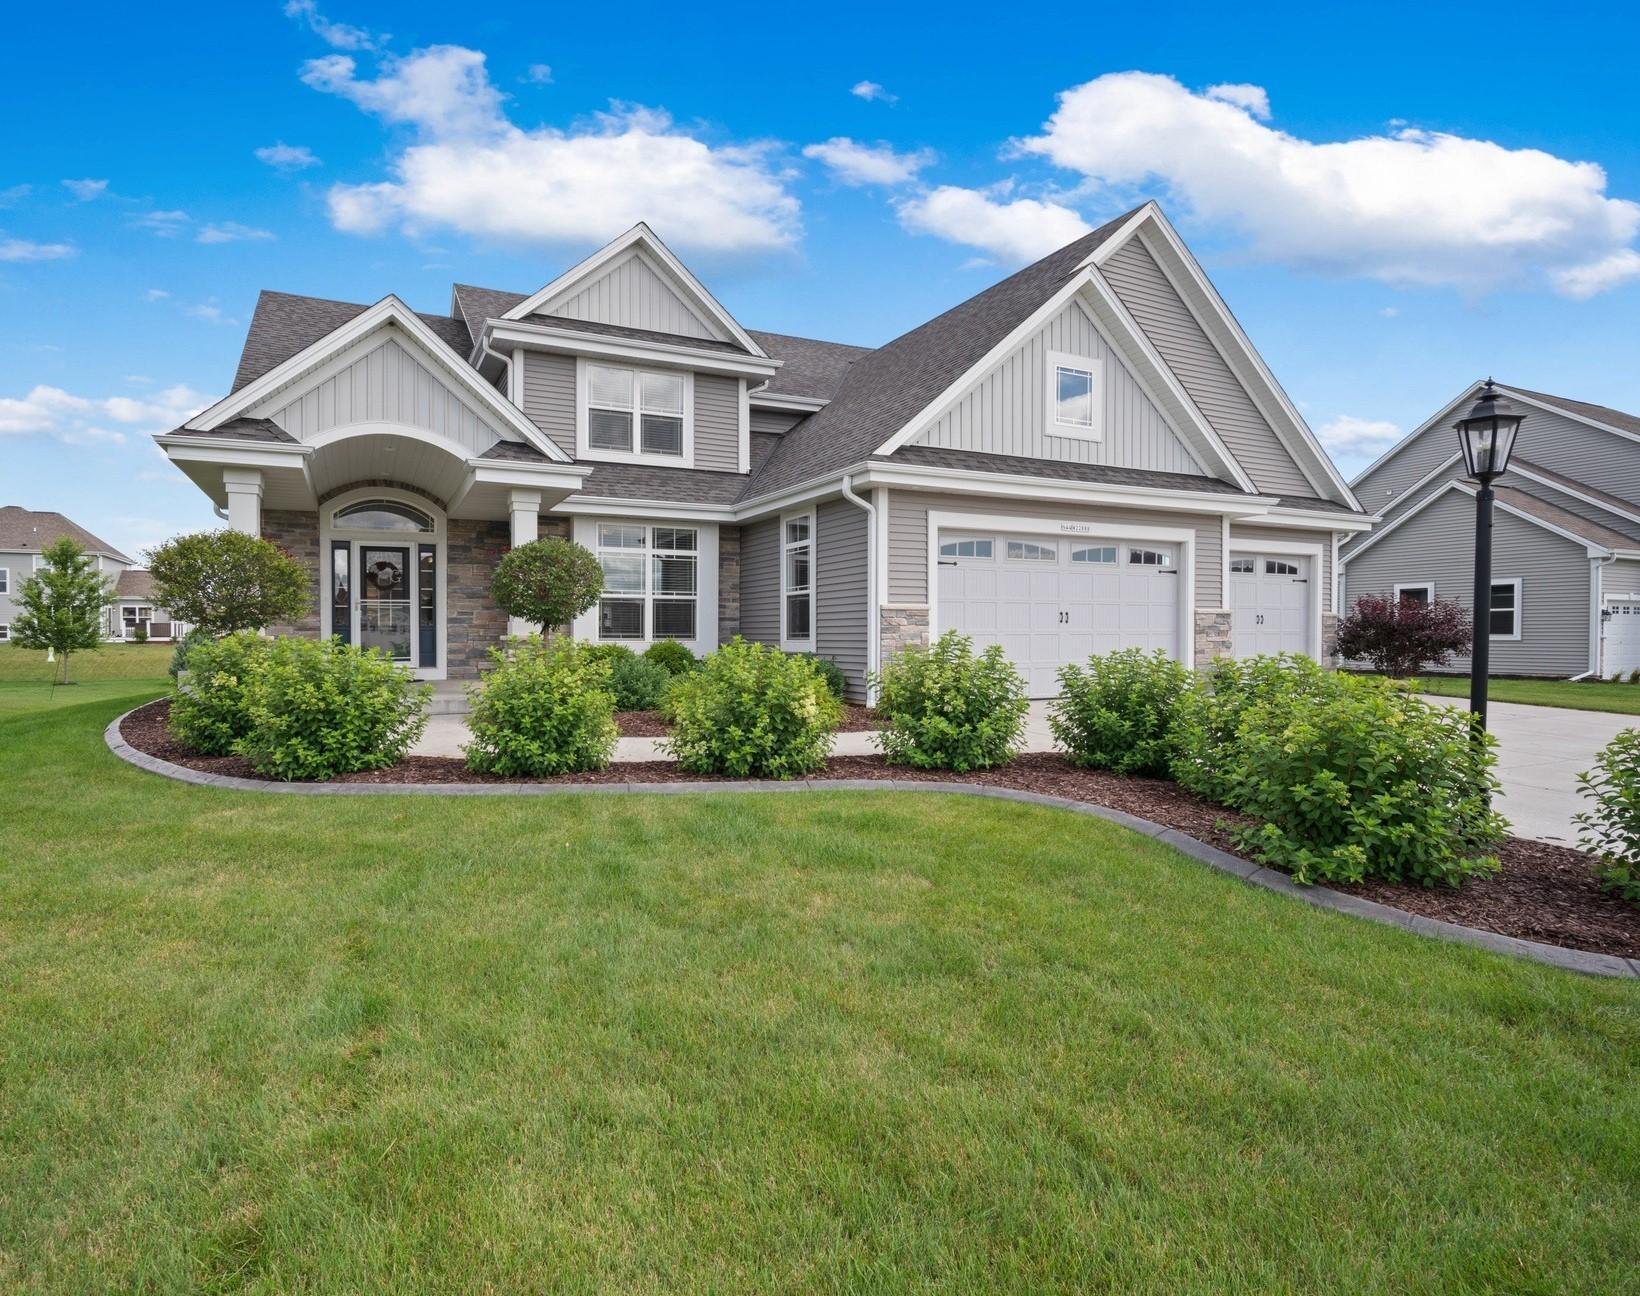 N44W22888 Bridge St, Pewaukee, Wisconsin 53072, 4 Bedrooms Bedrooms, 10 Rooms Rooms,2 BathroomsBathrooms,Single-Family,For Sale,Bridge St,1699807